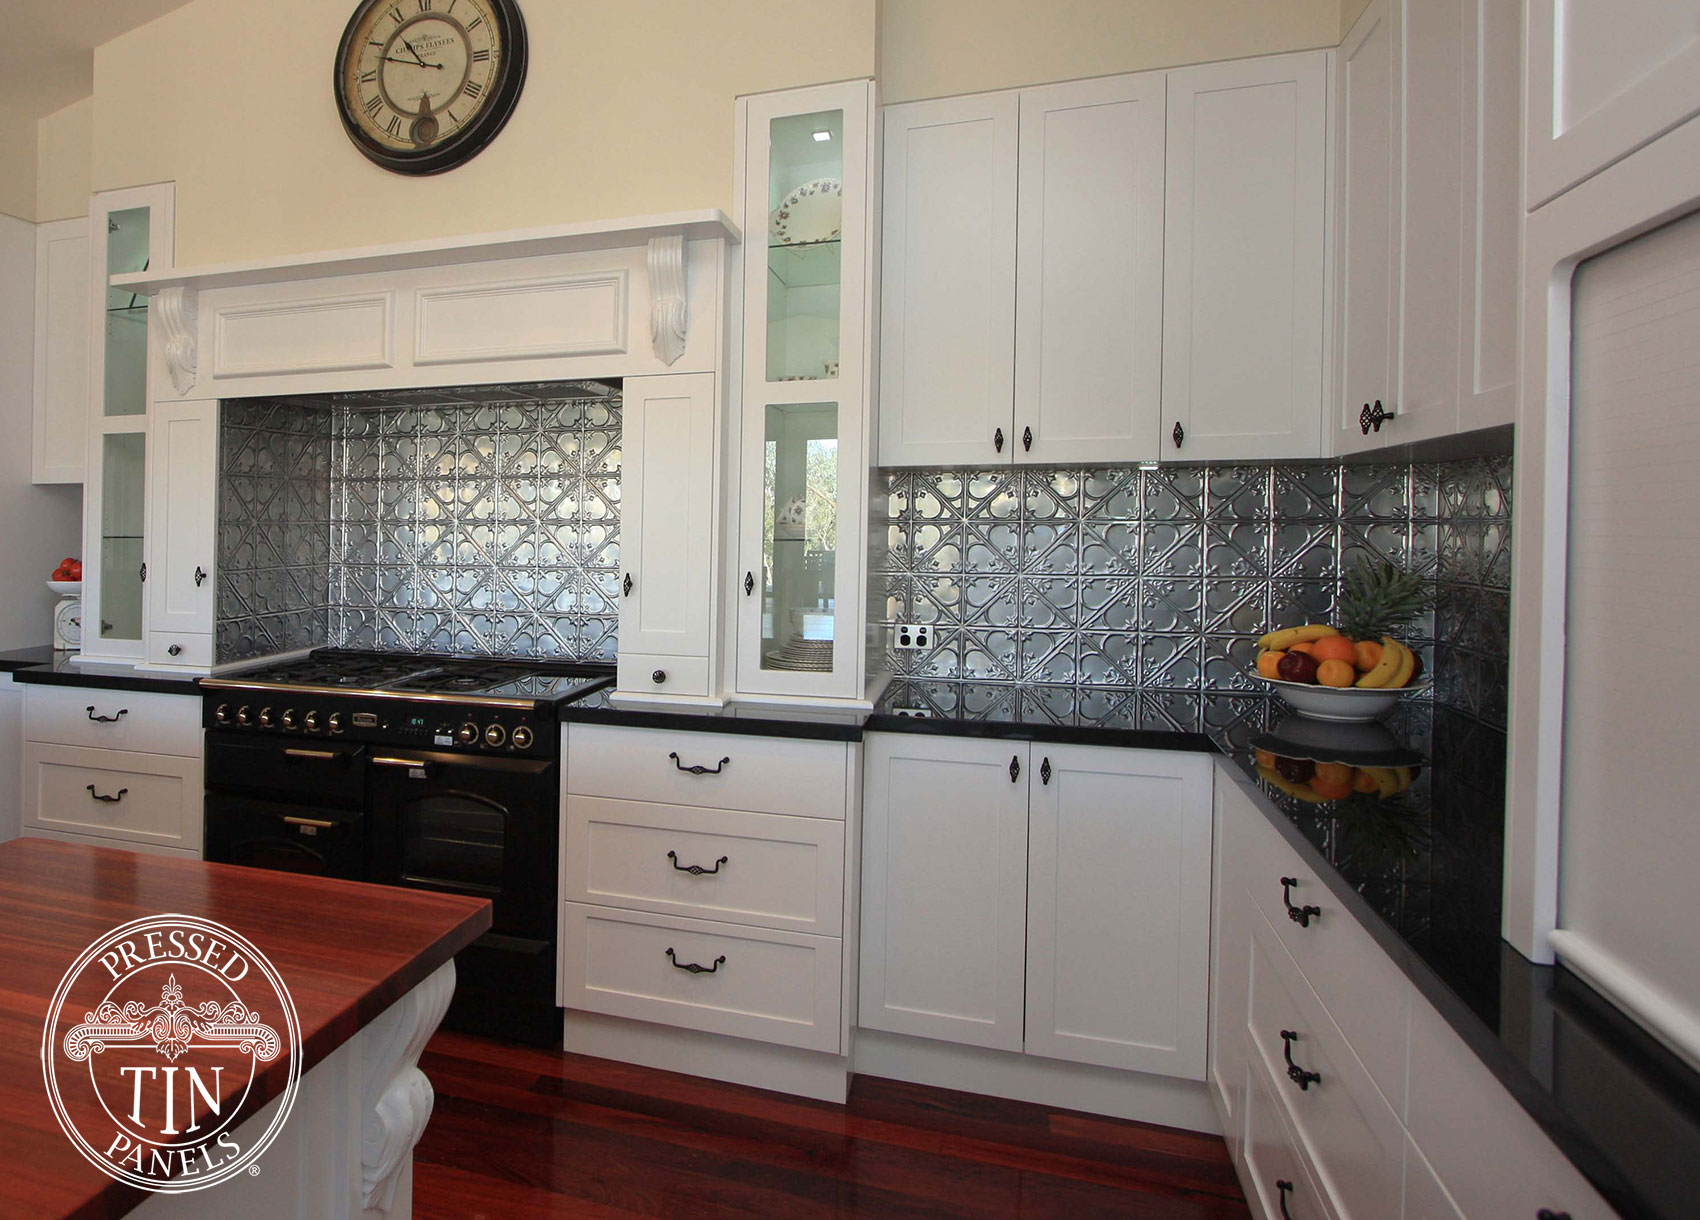 Snowflakes Silver Kitchen Splashback Flair Cabinets